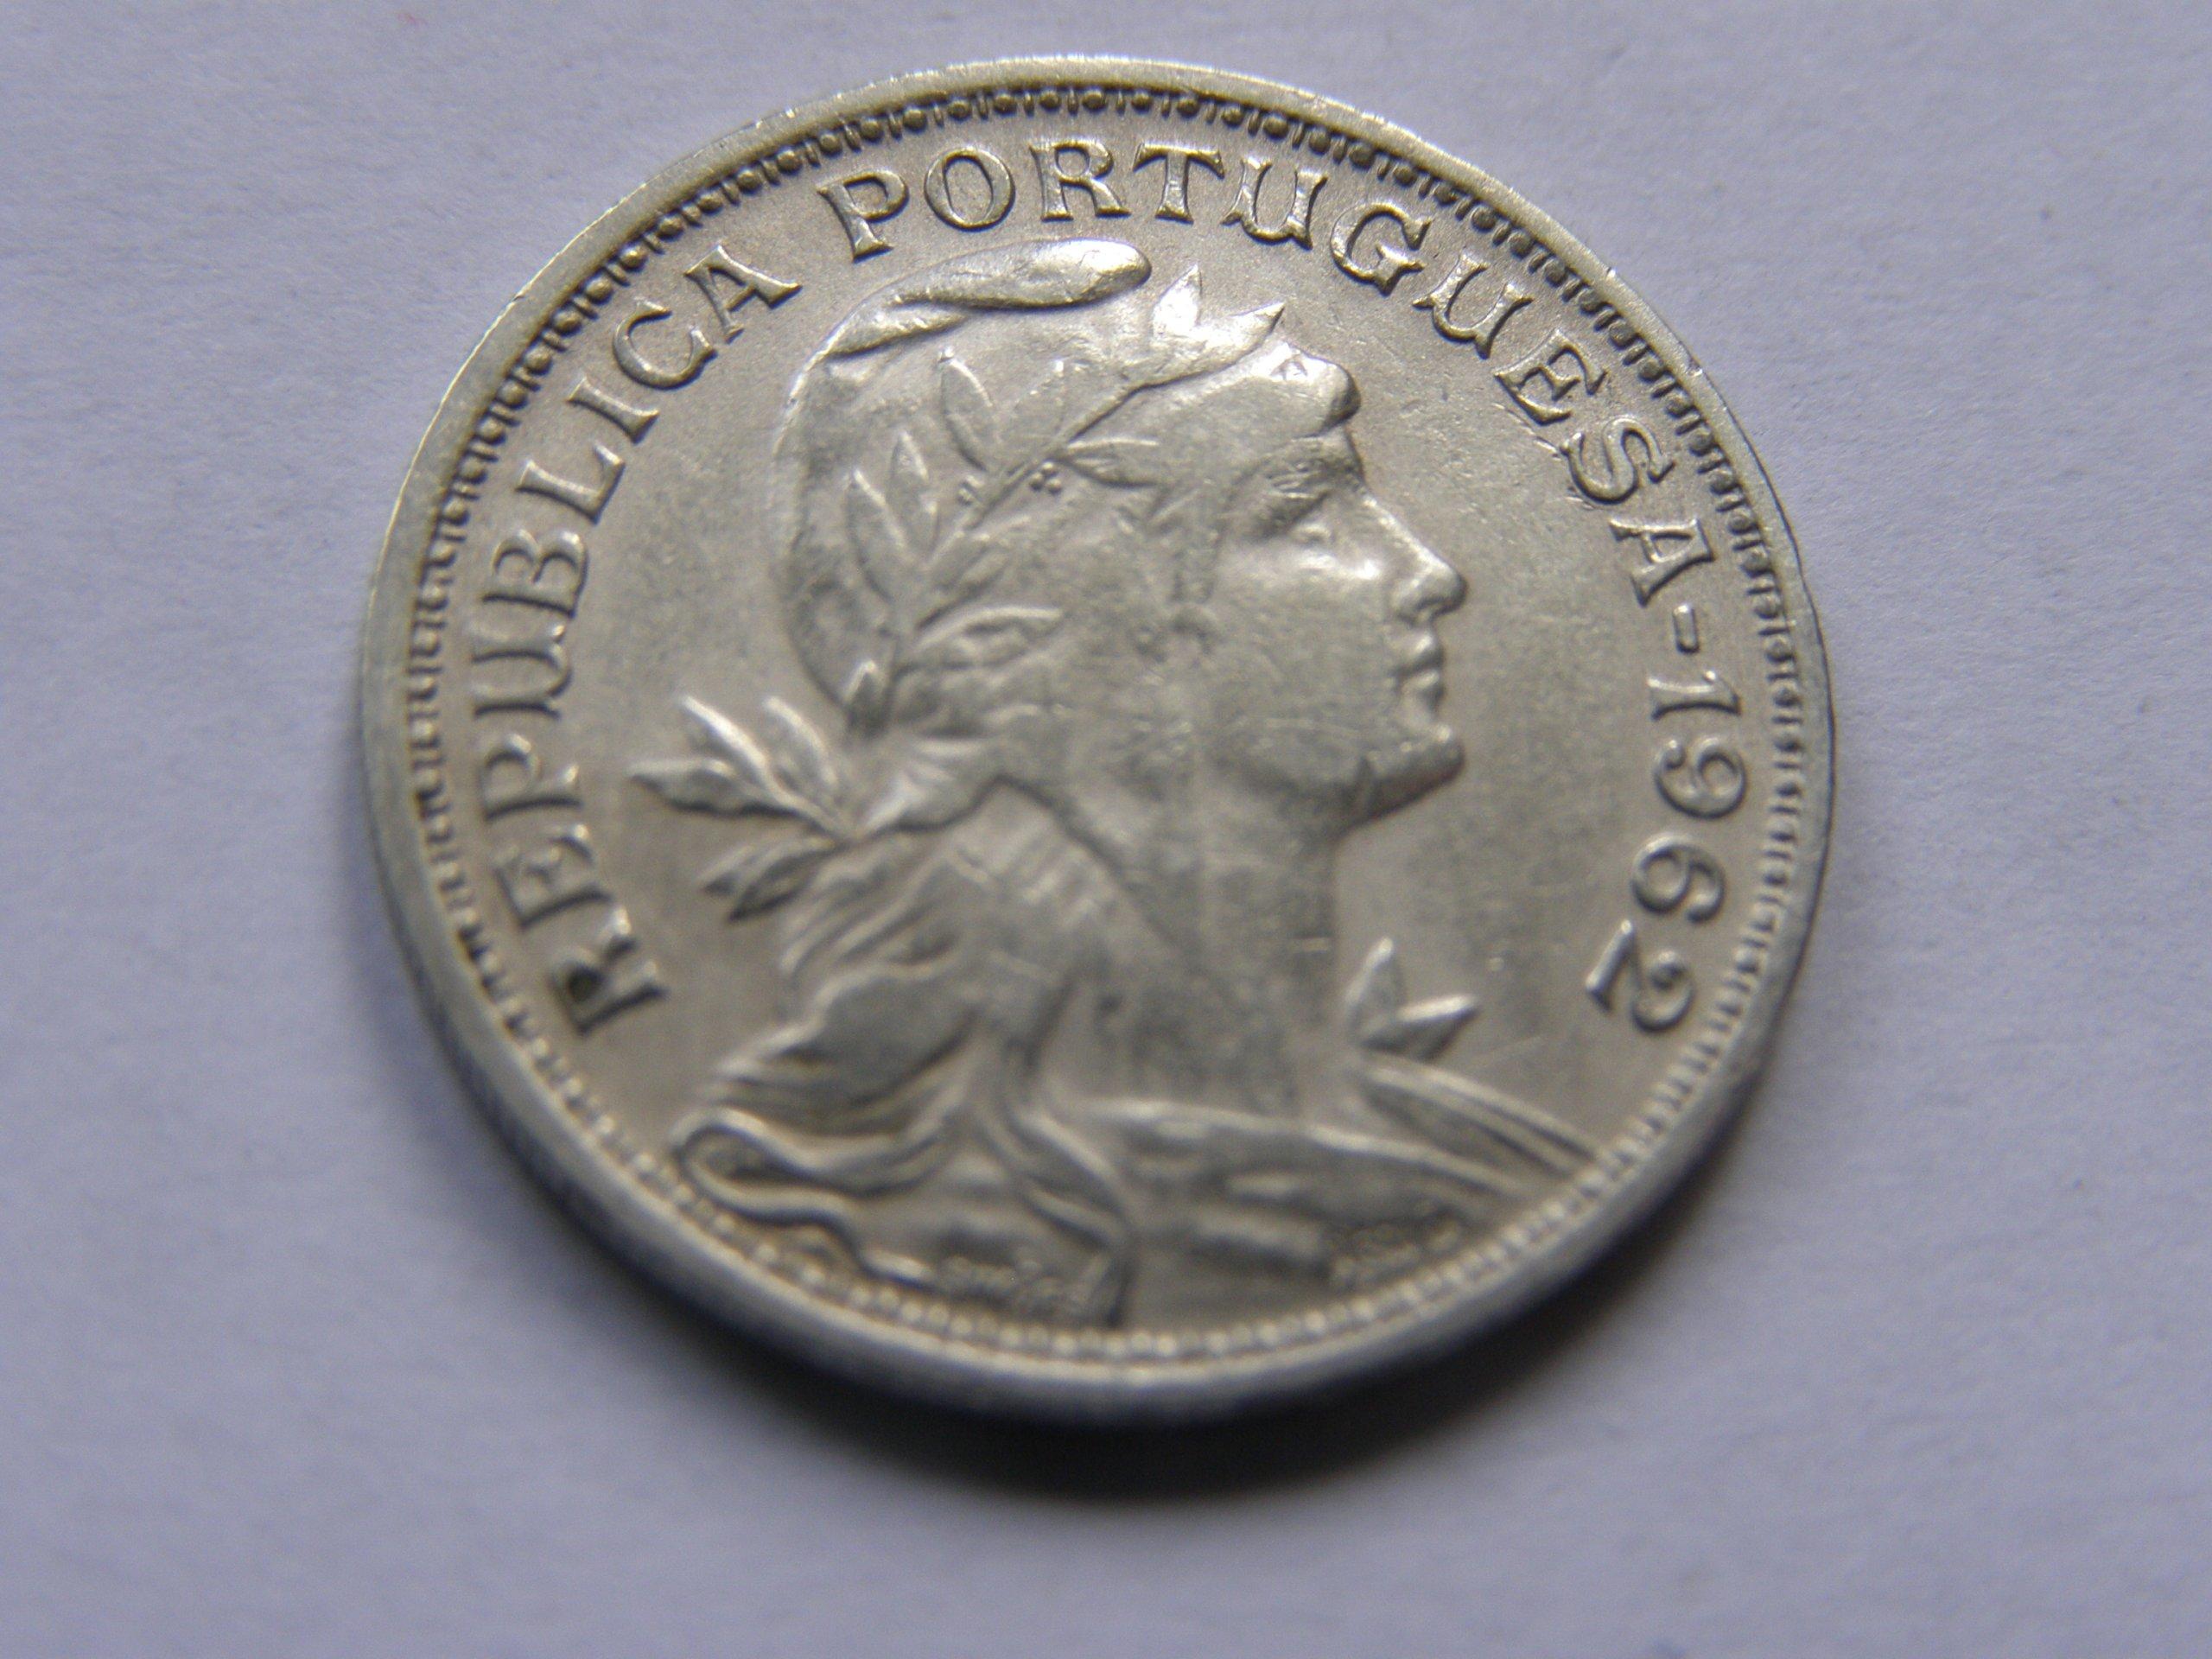 PORTUGALIA PORTUGAL 50 CENTAVOS 1962 ROK !!!!!!!!!